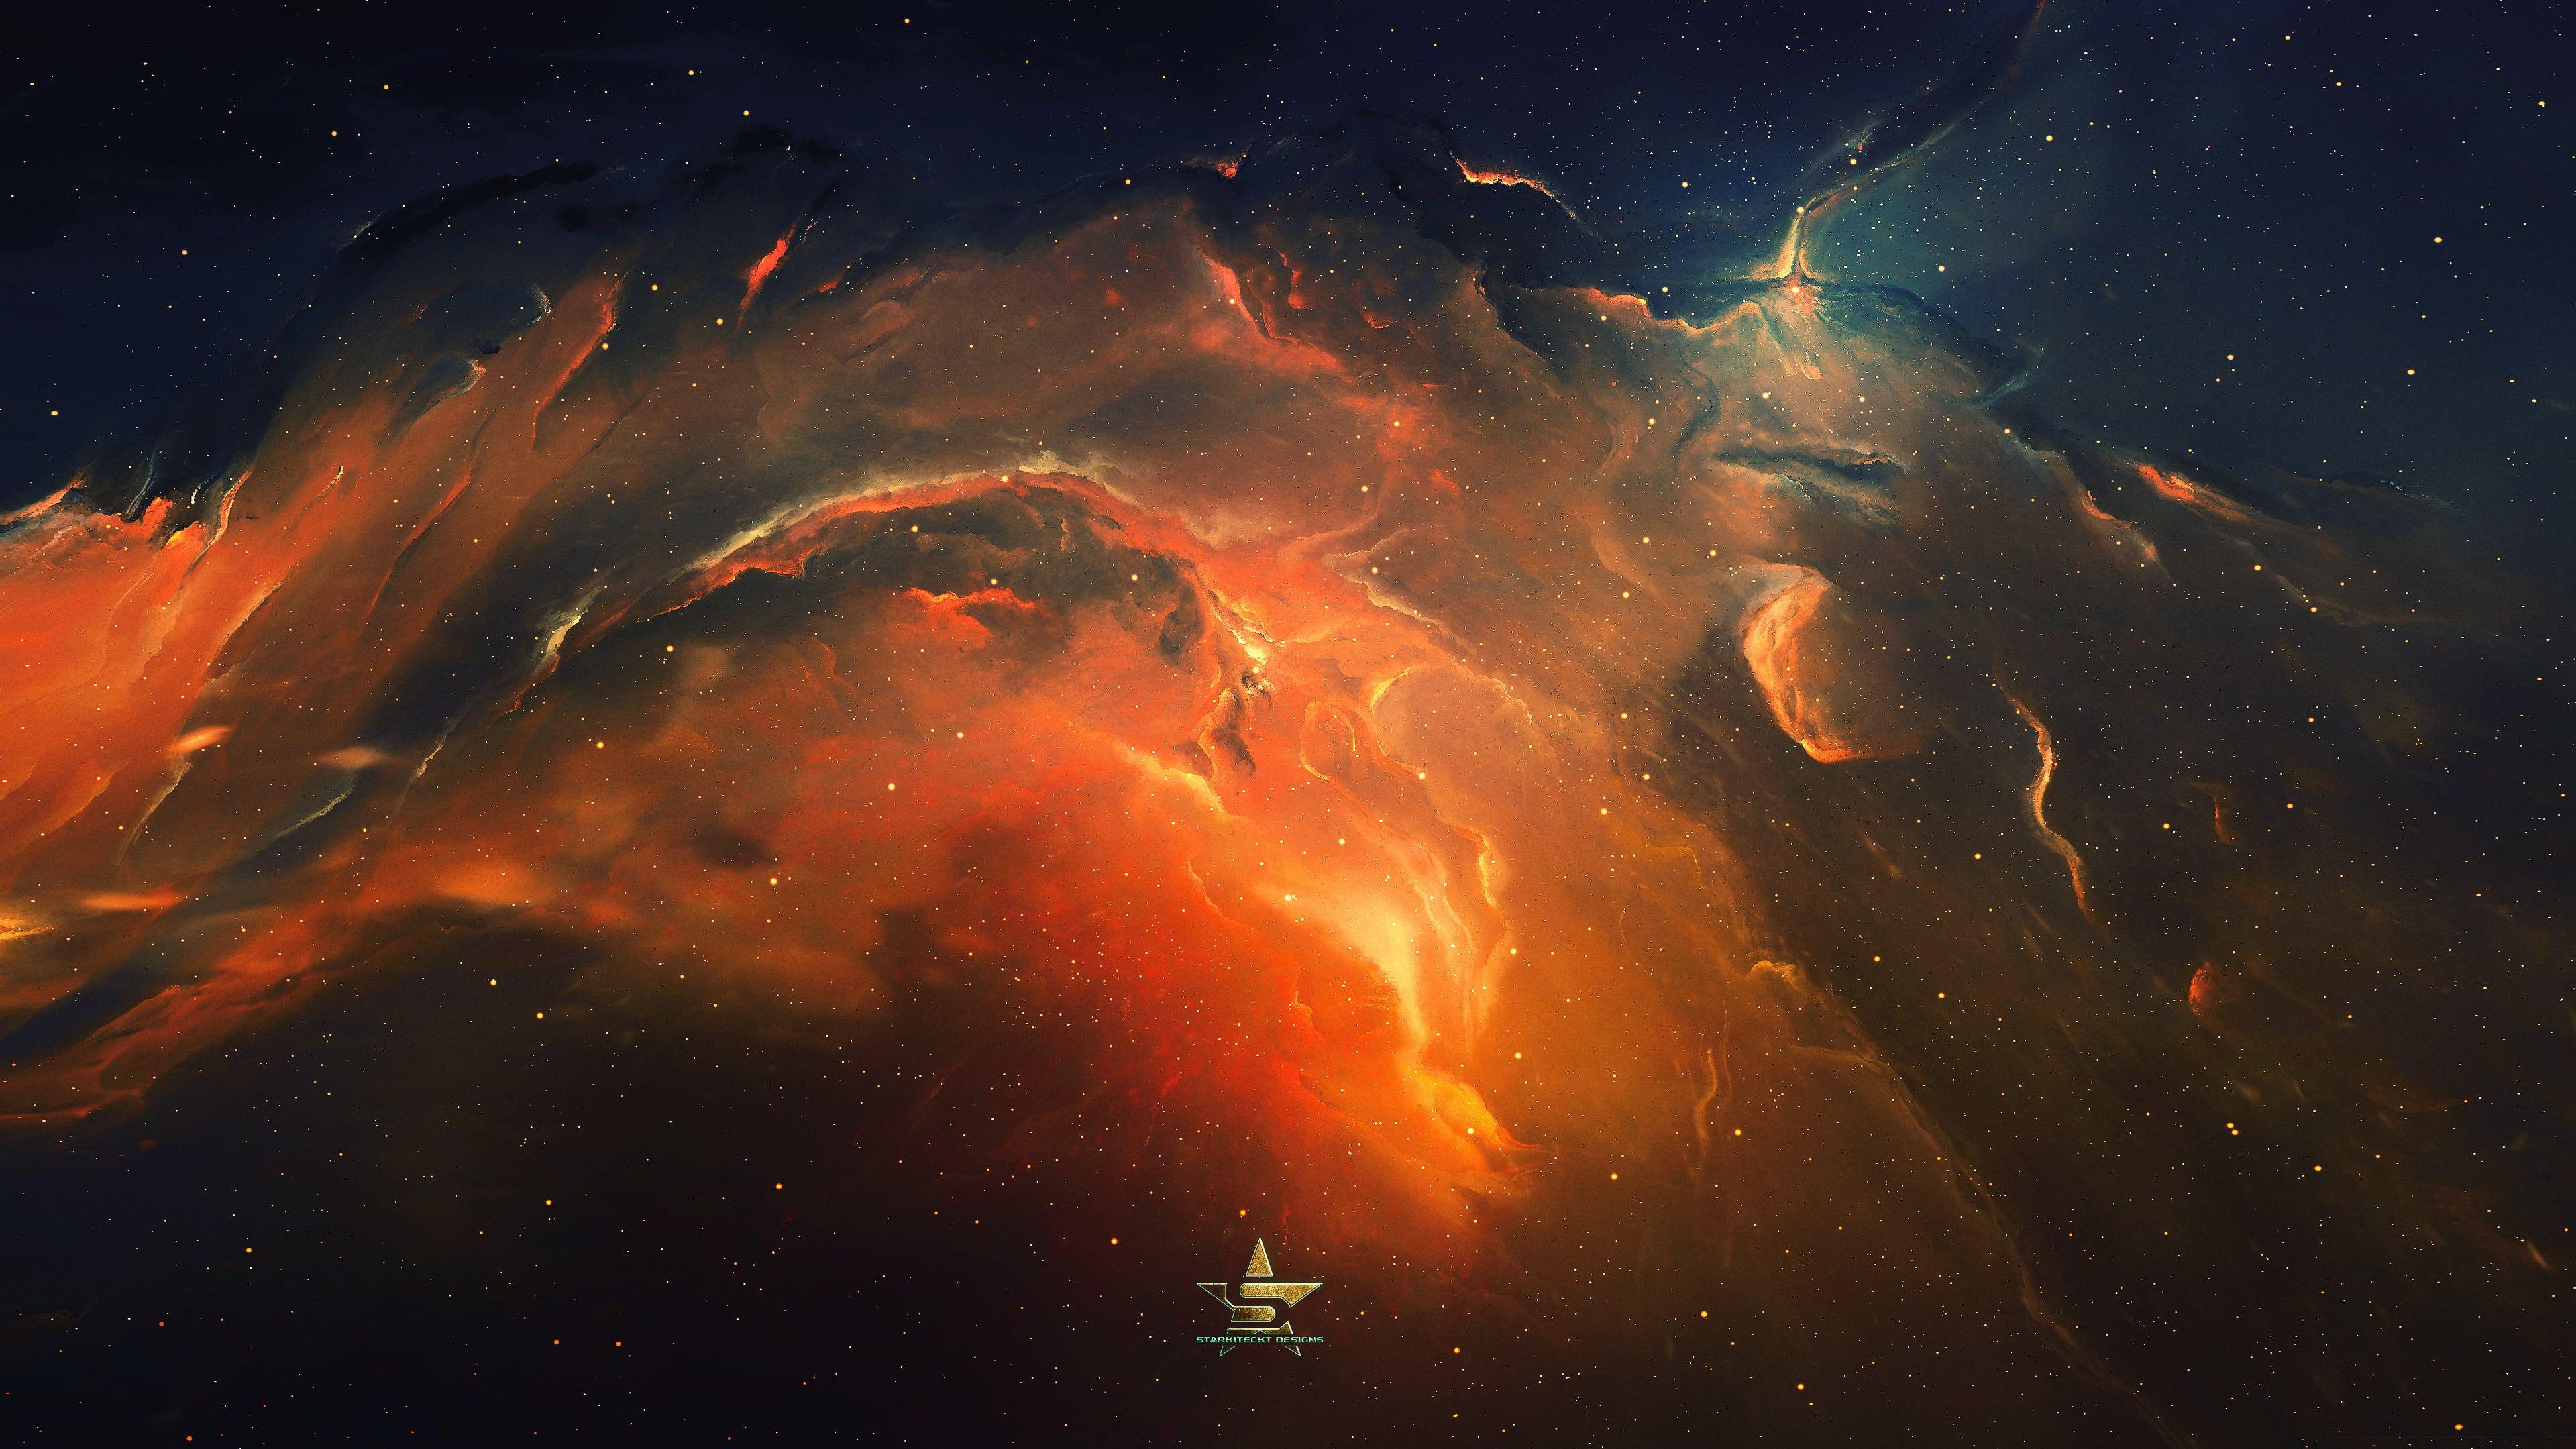 Orange And Black Galaxy Wallpaper Galaxy Space Stars Universe Spacescapes Nebula 4k Wallpaper H In 2021 Nebula Wallpaper Galaxy Wallpaper Iphone Wallpaper Sky